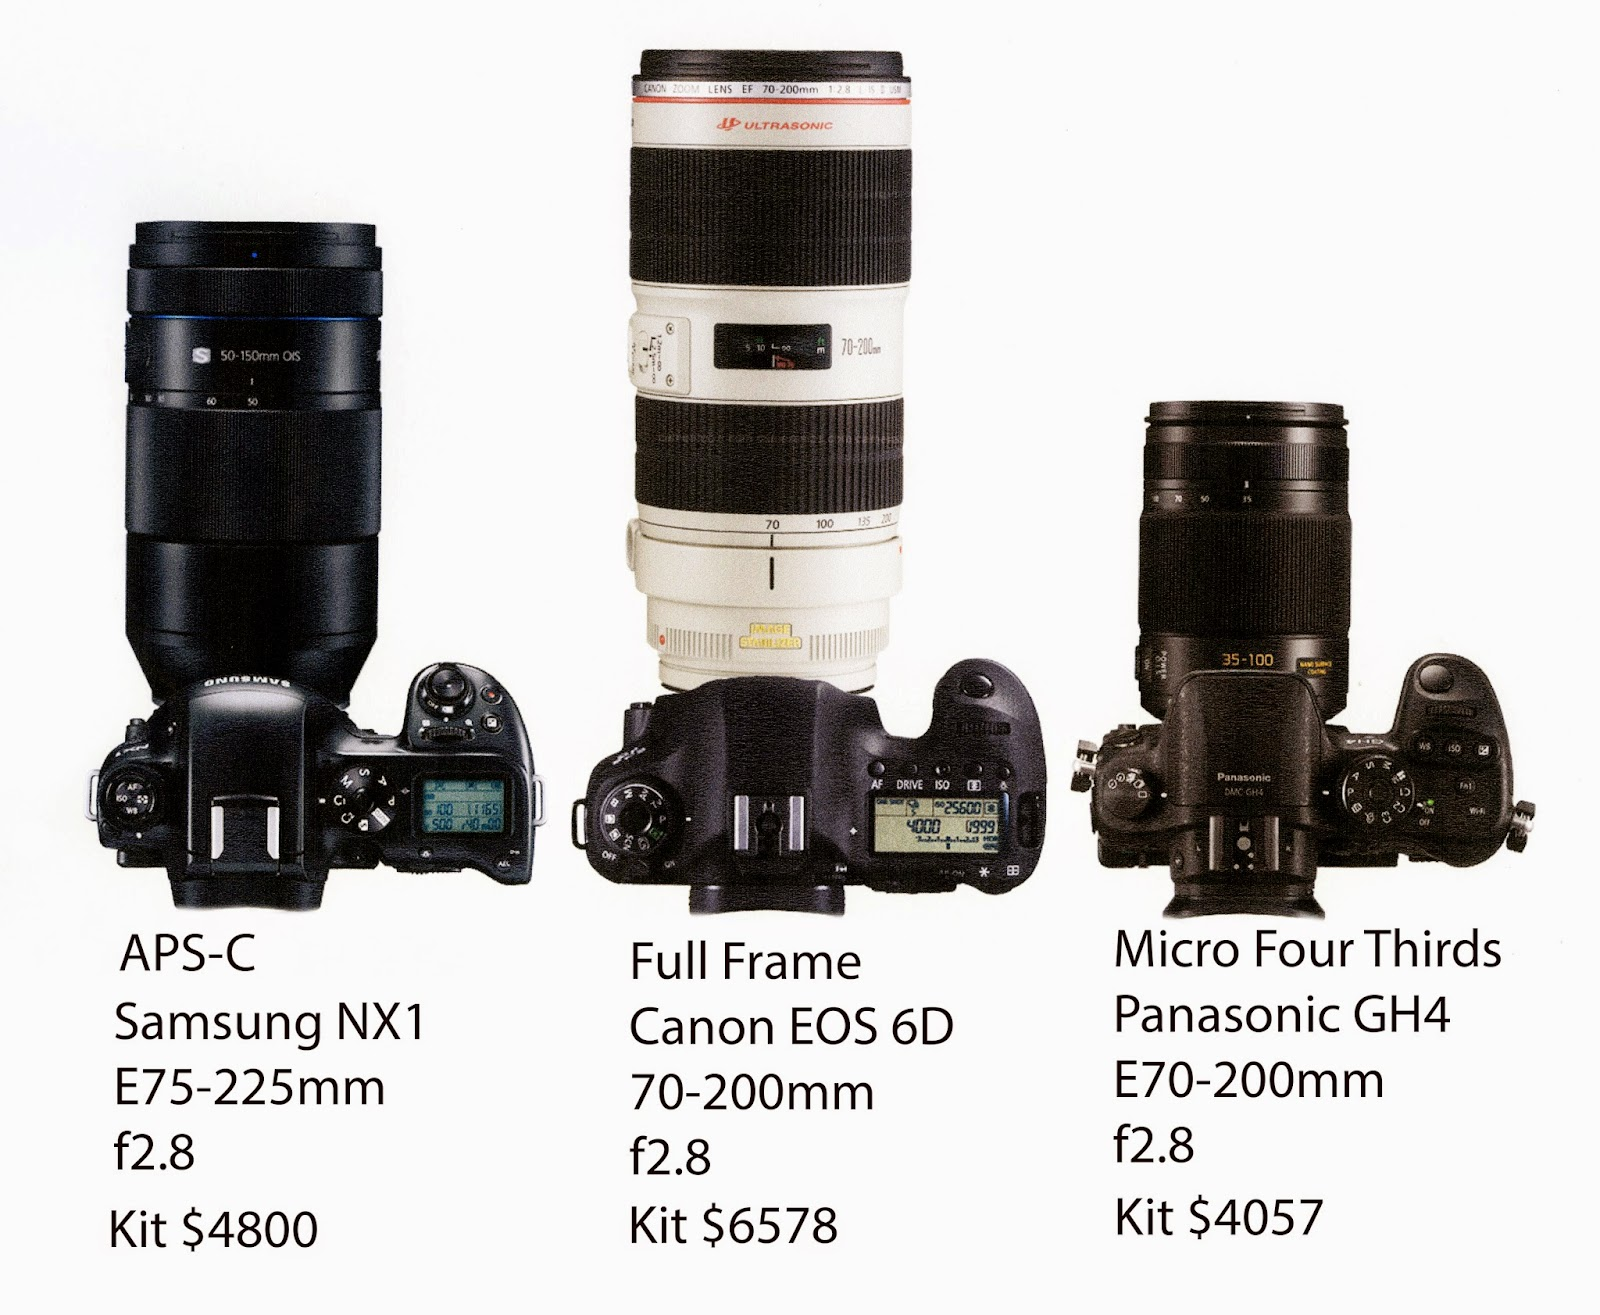 Will APS-C become obsolete ? | Camera Ergonomics